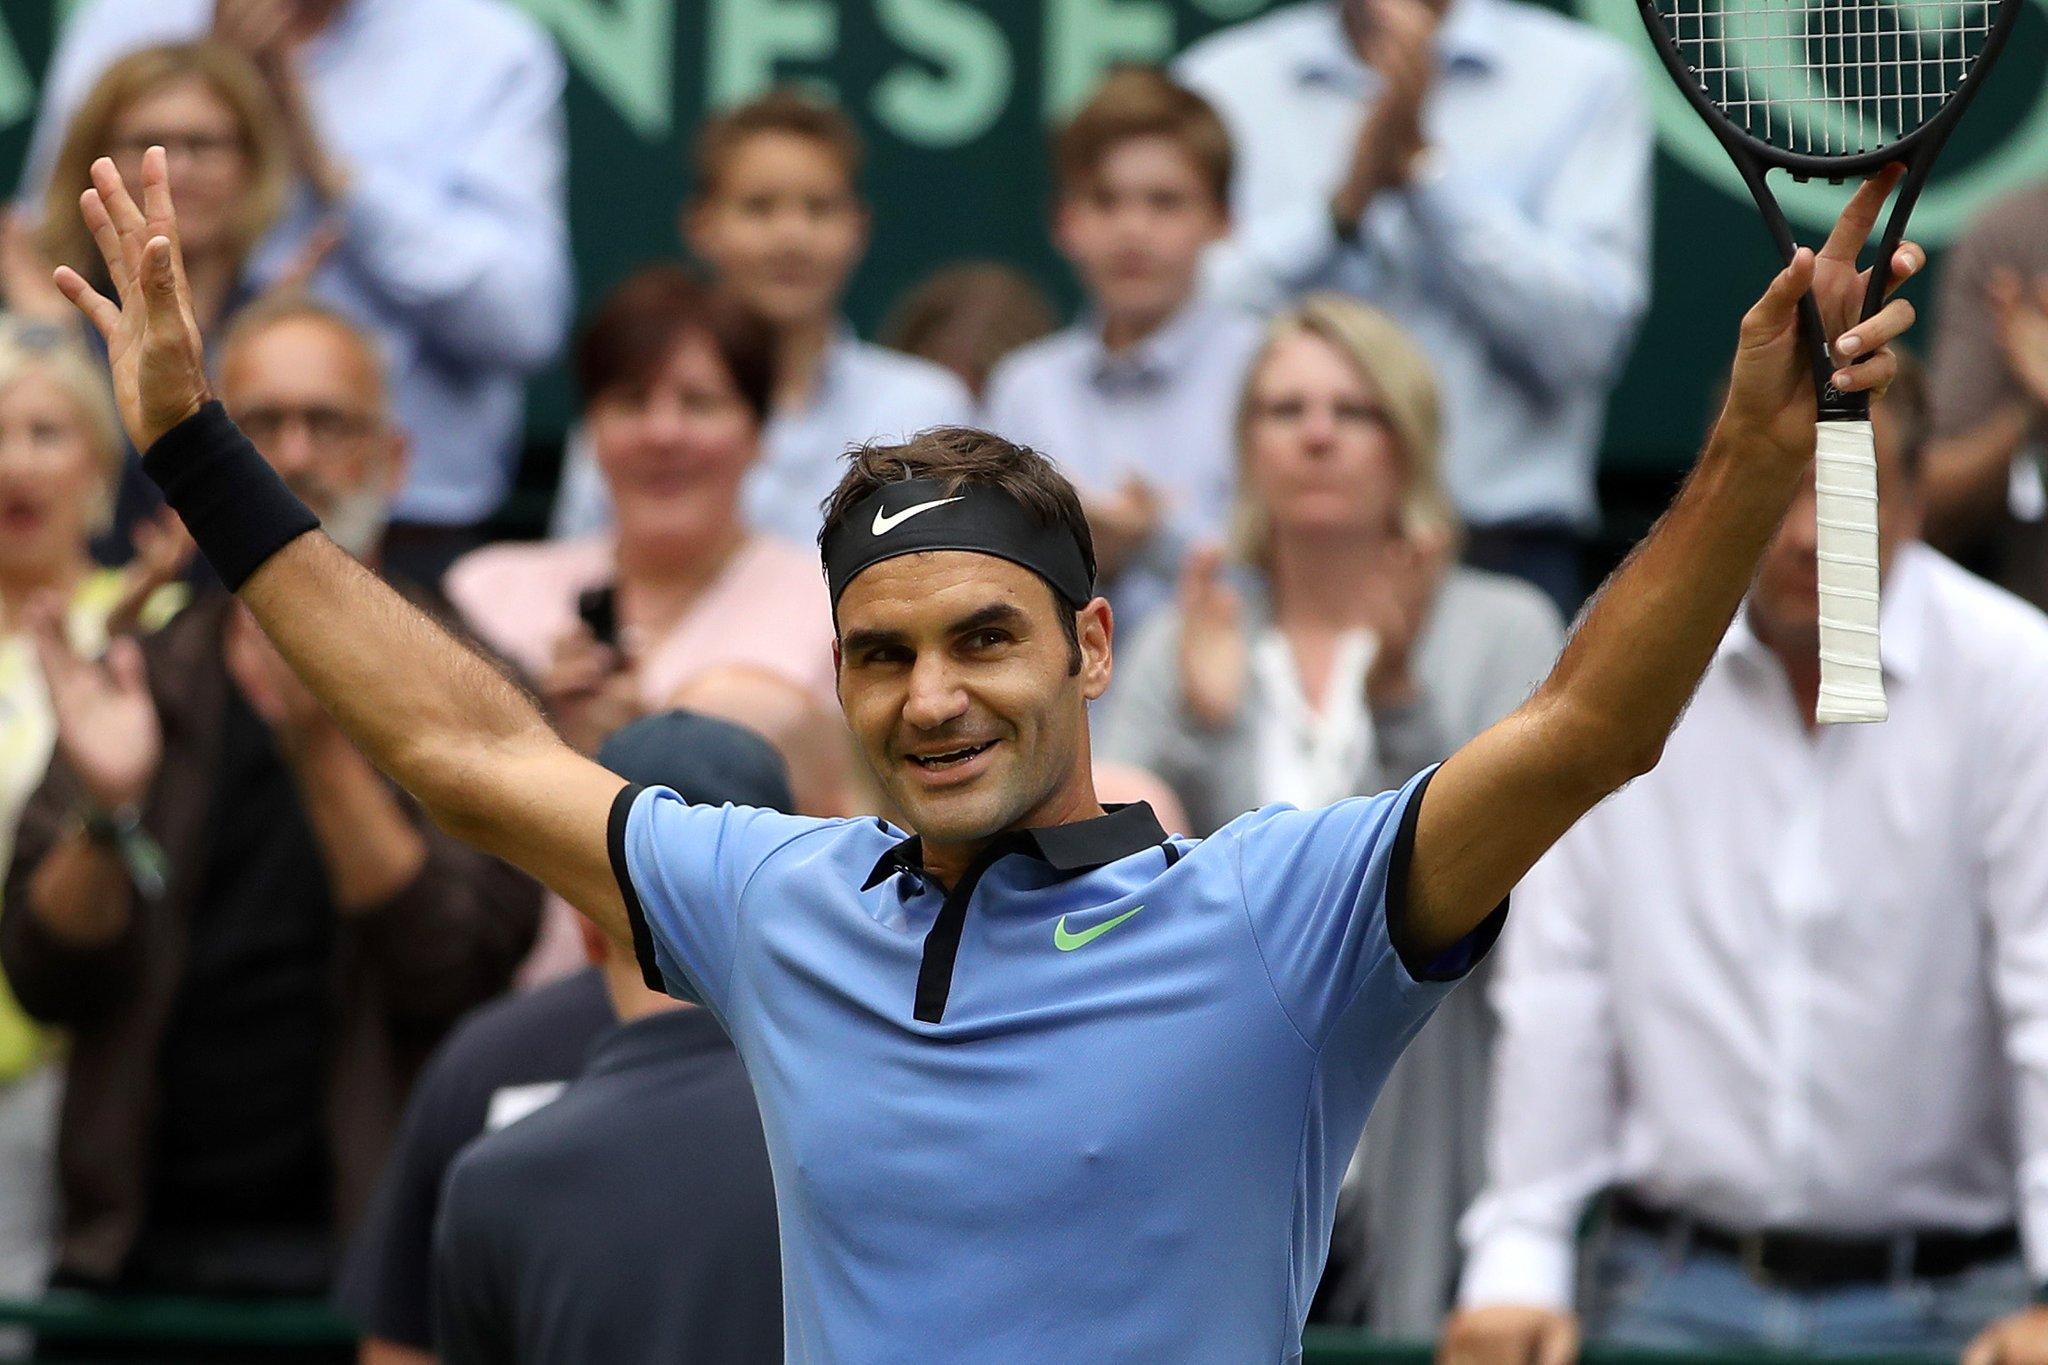 Федерер в 9-й раз выиграл турнир в Халле